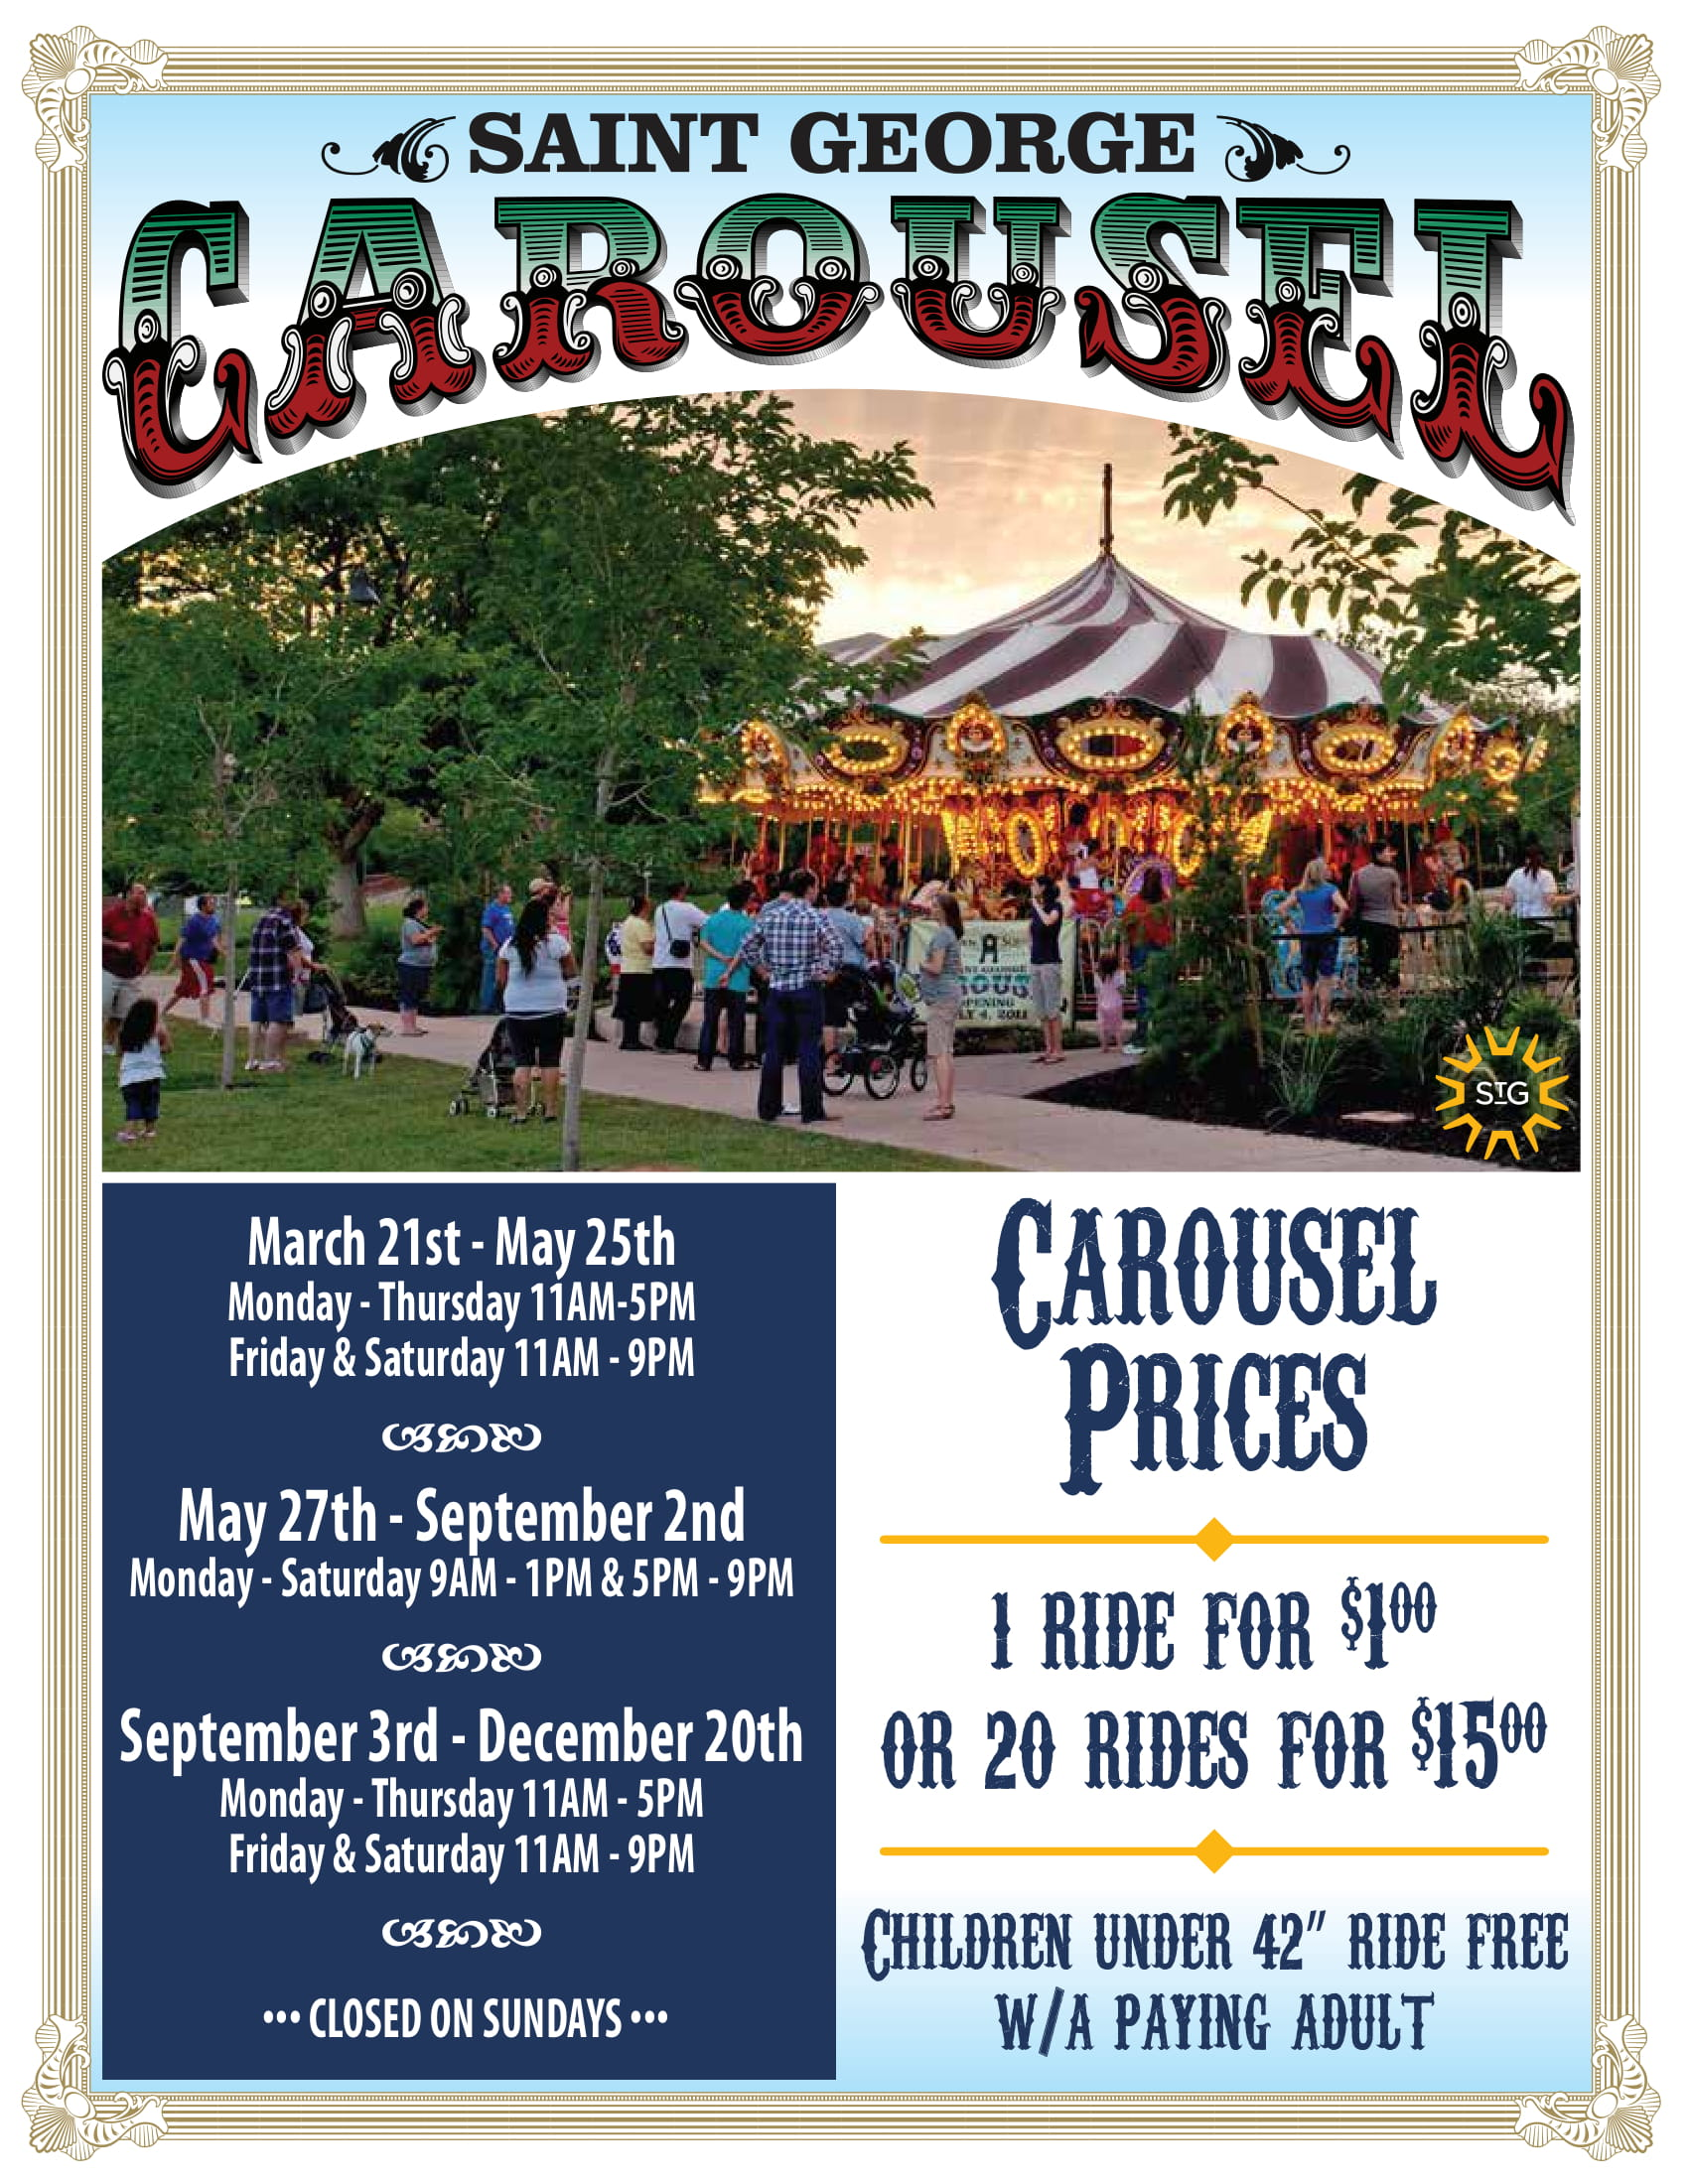 st-george-carousel.jpg